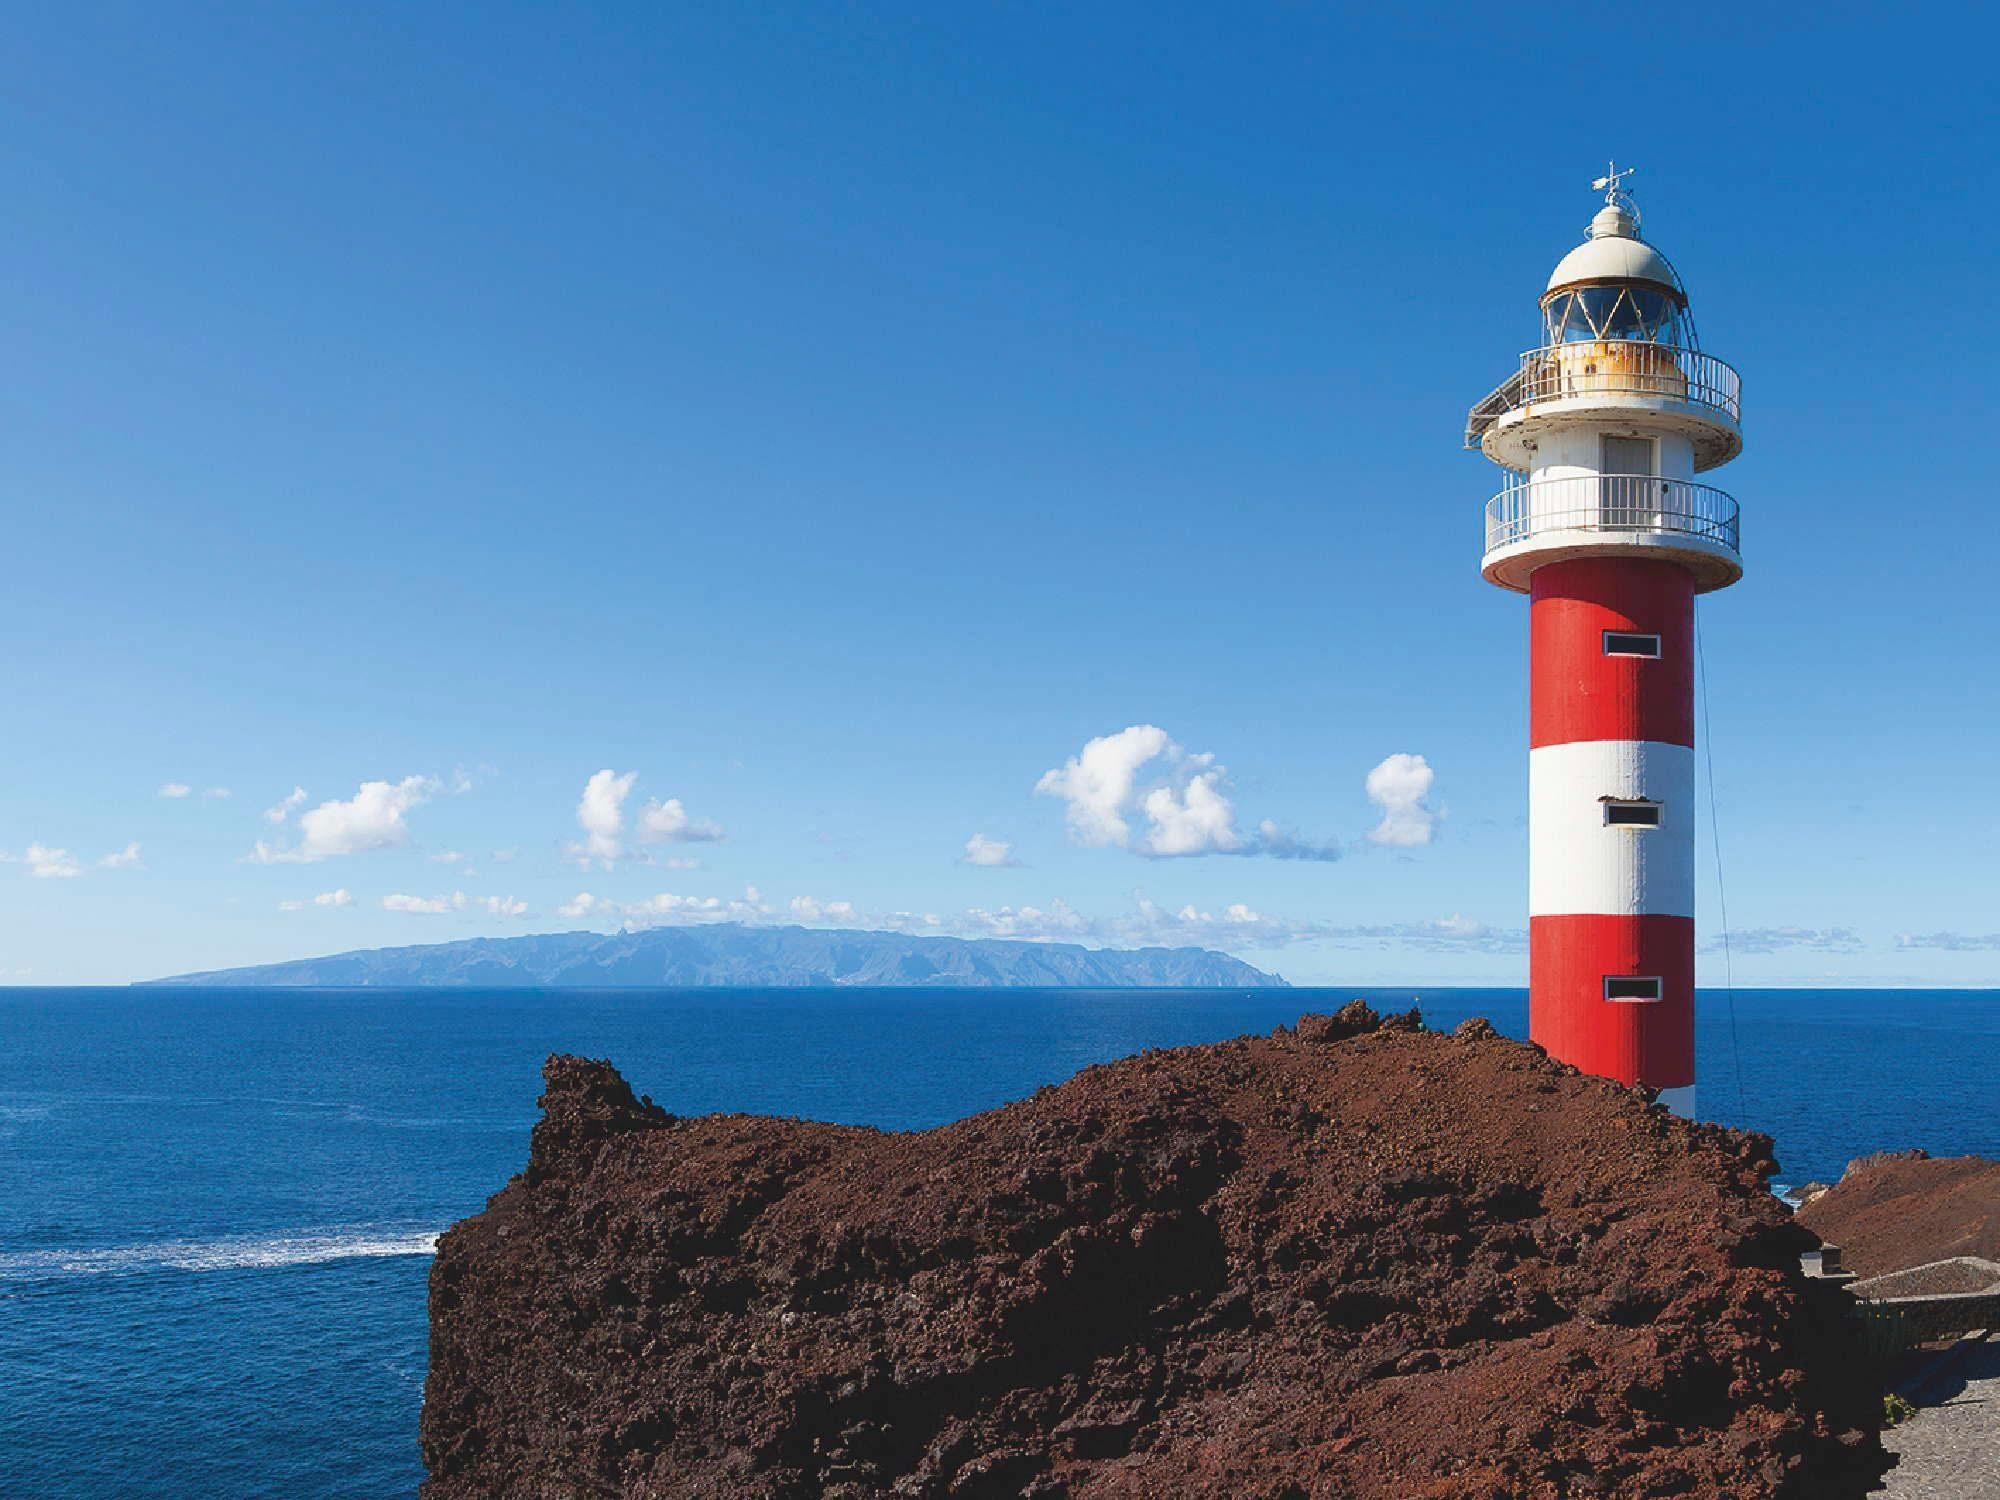 Home affaire Glasbild »V. Torres: Leuchtturm in Punta Teno, Teneriffa, Spanien«, 80/60 cm